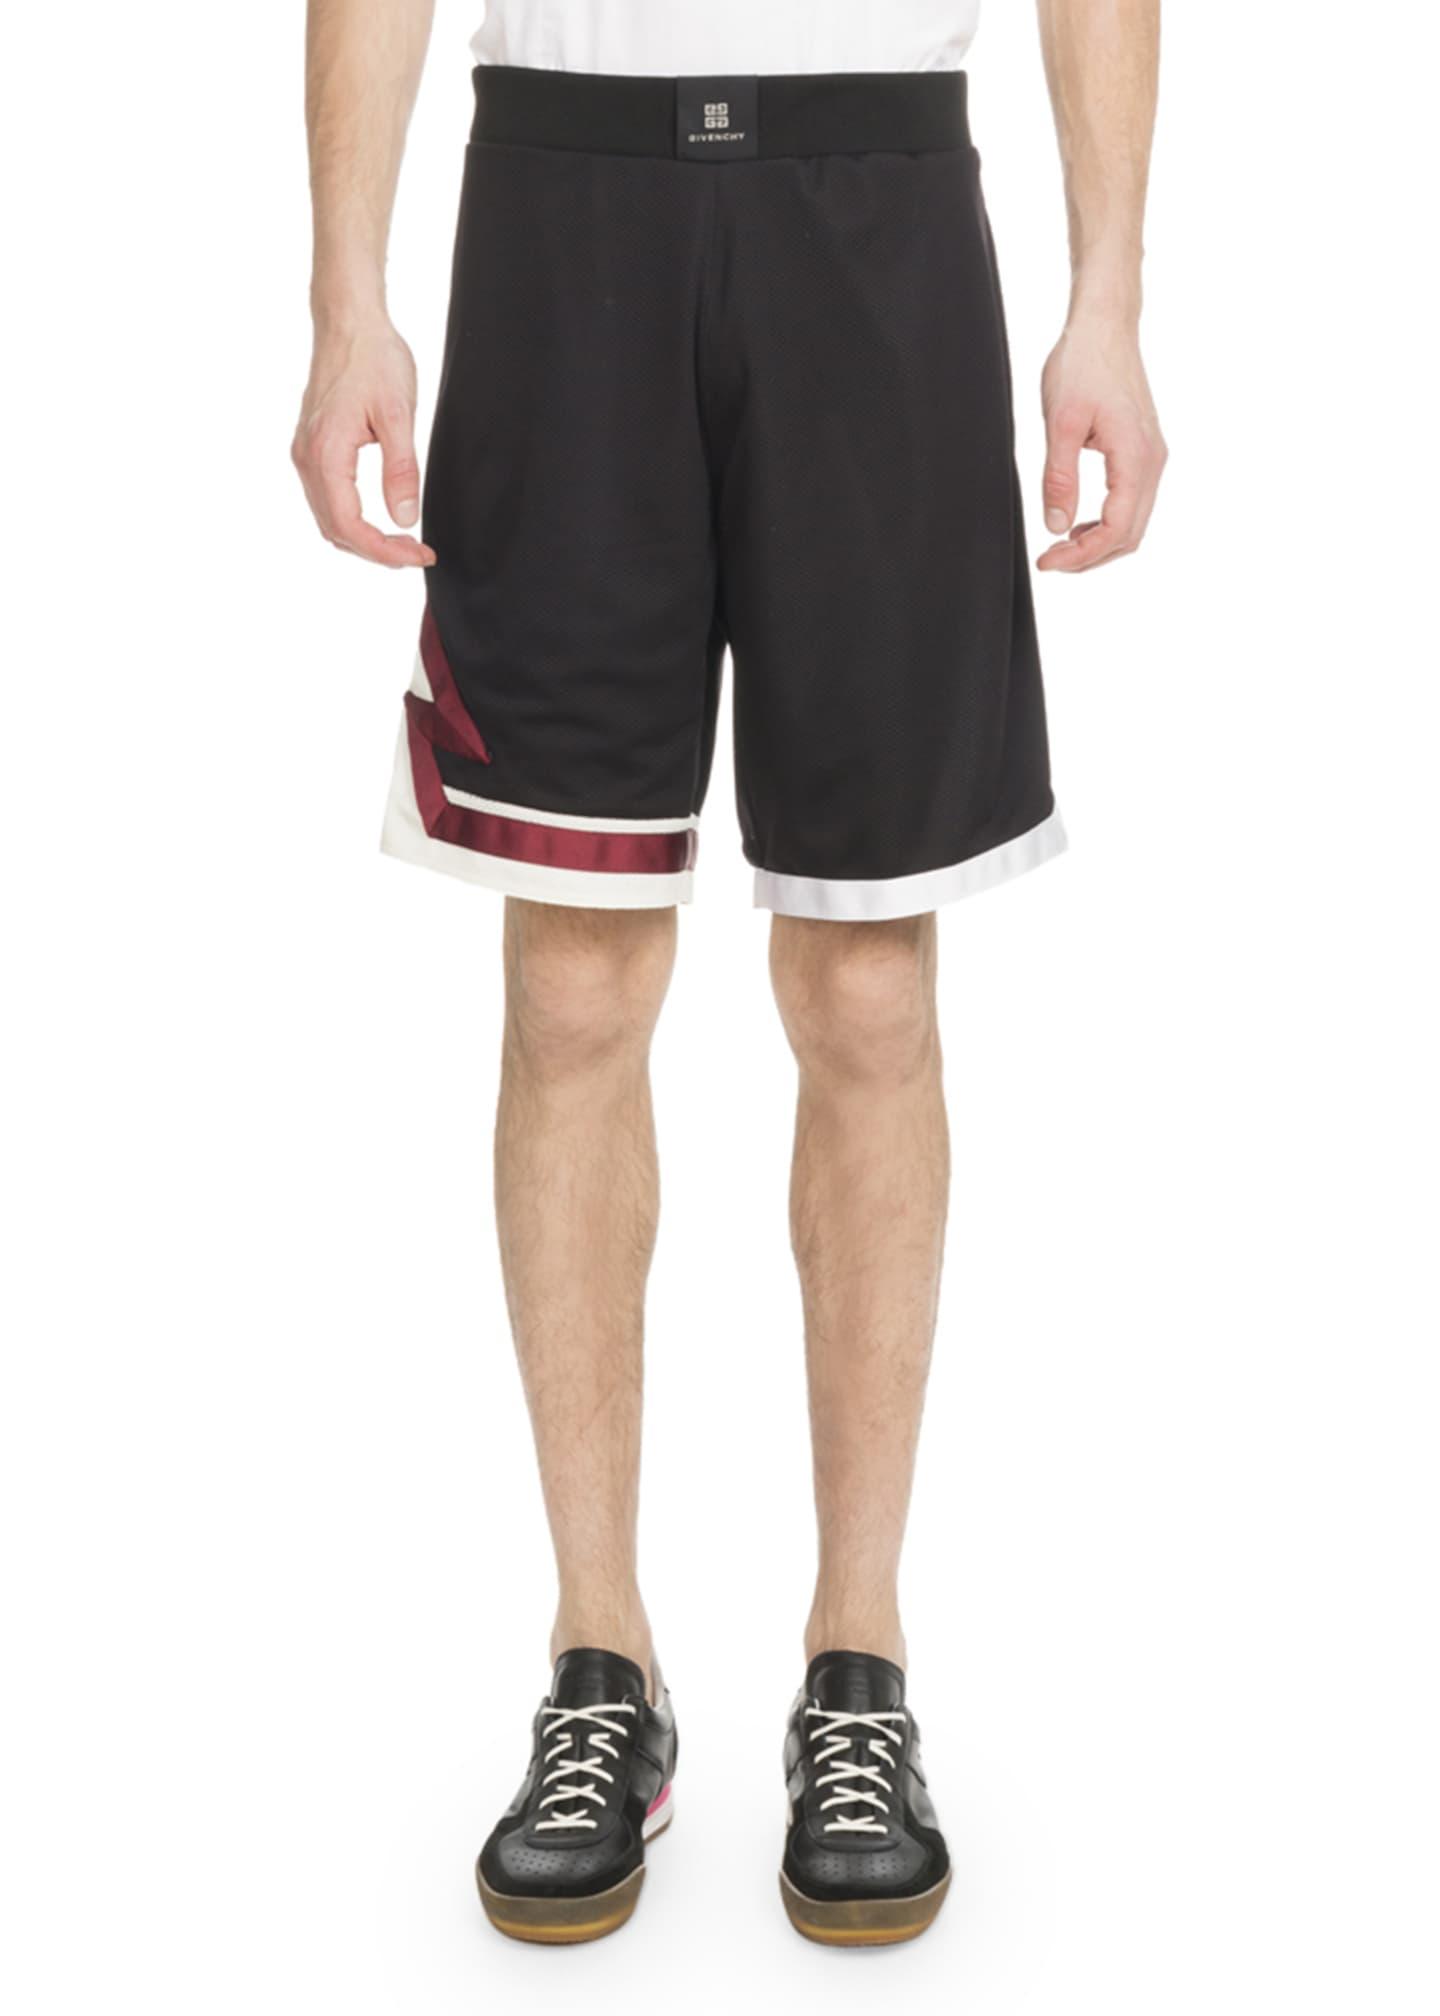 Givenchy Men's Lightning Bolt Basketball Shorts